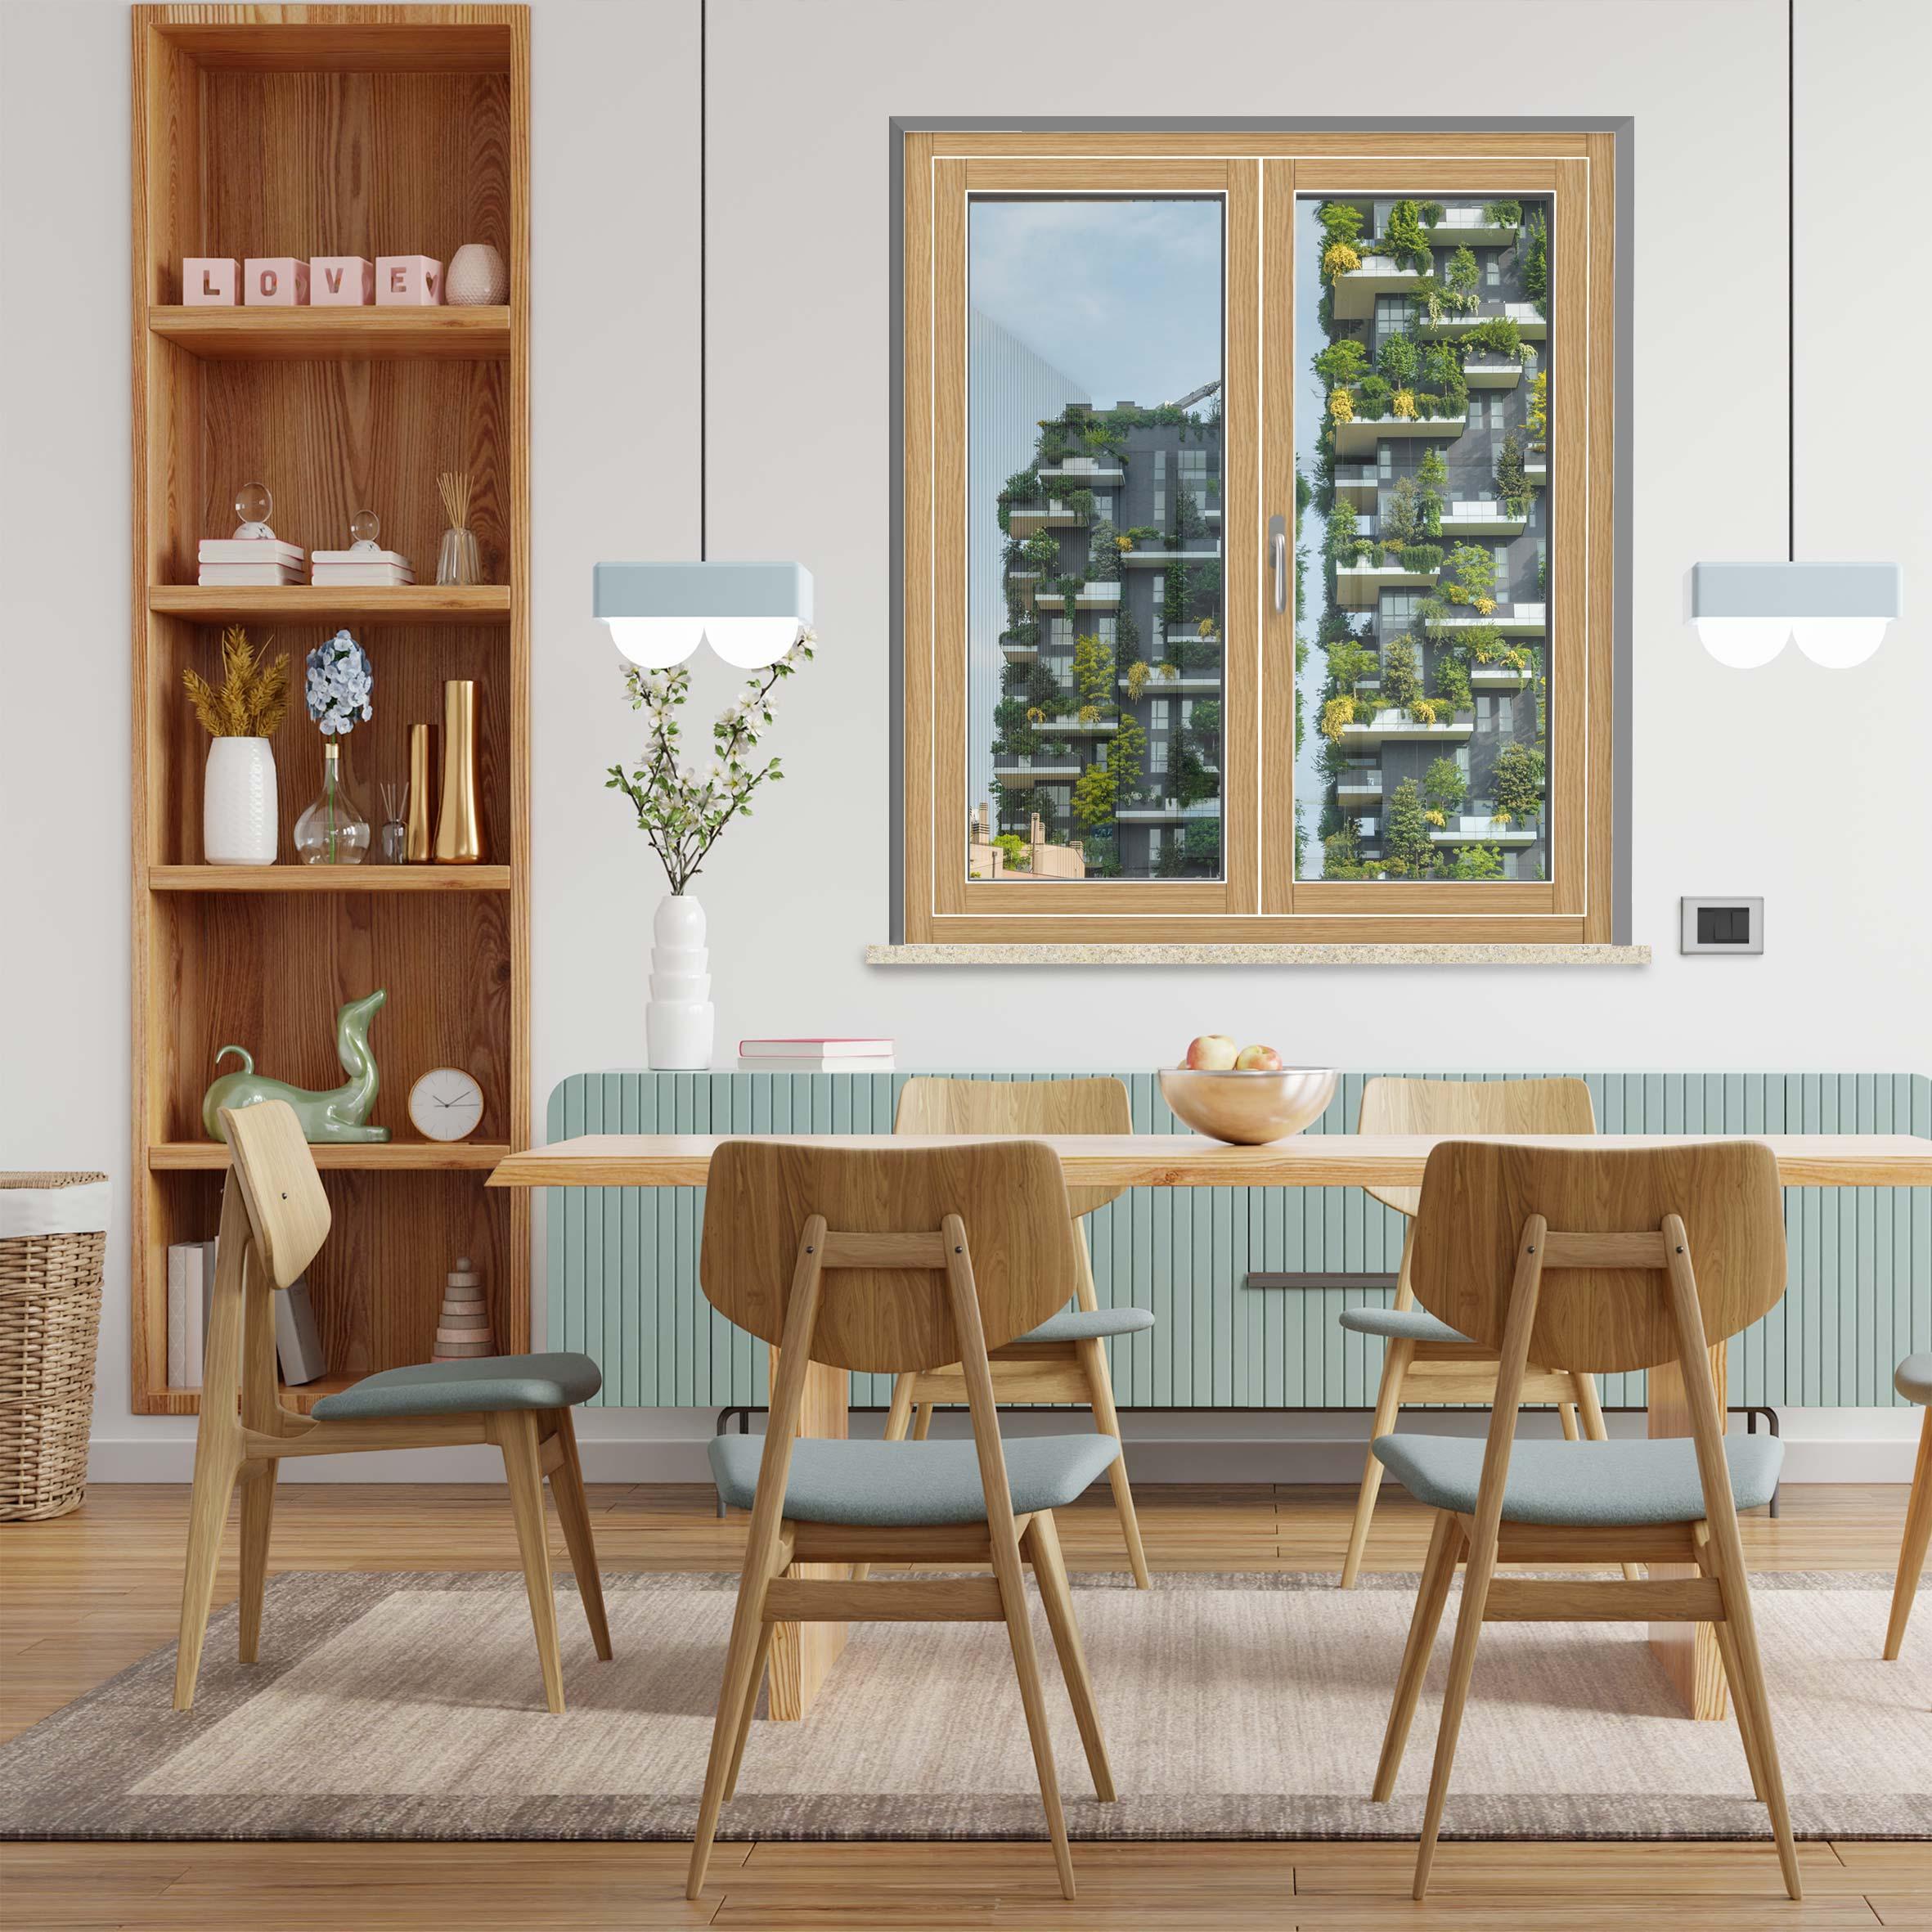 https://www.allpaint.it/wp-content/uploads/2021/09/finestre-thermika90wood-legno-allpaint.jpg